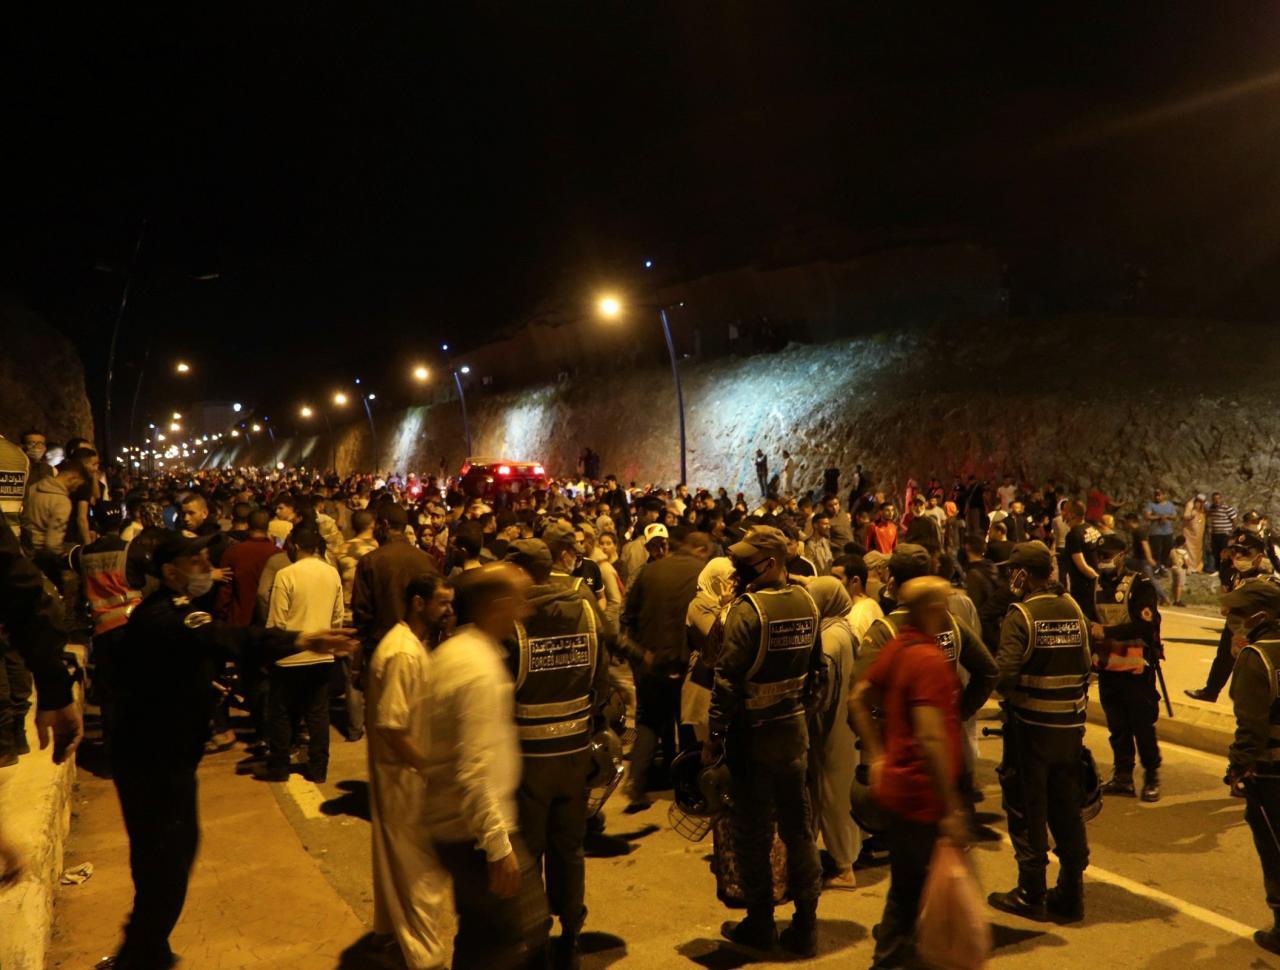 Ascienden a 5.000 el número de marroquíes que han entrado hoy en Ceuta